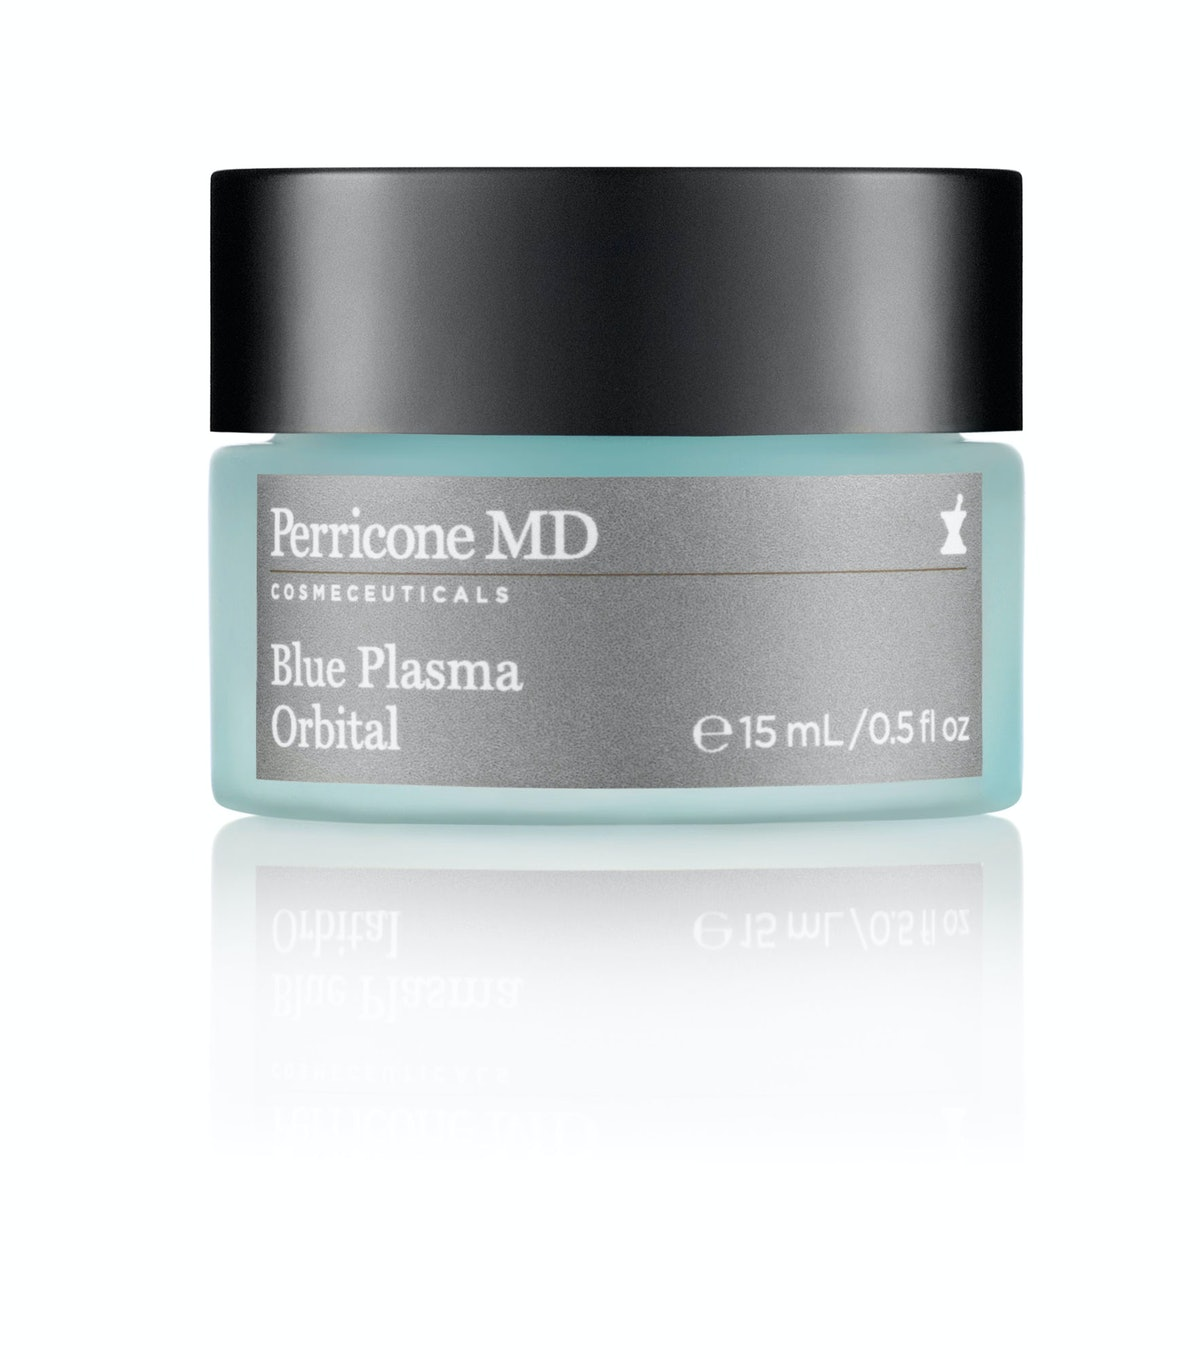 Perricone MD Blue Plasma Orbital daily eye peel, $65, [nordstrom.com](http://rstyle.me/n/dksjs3w3n).